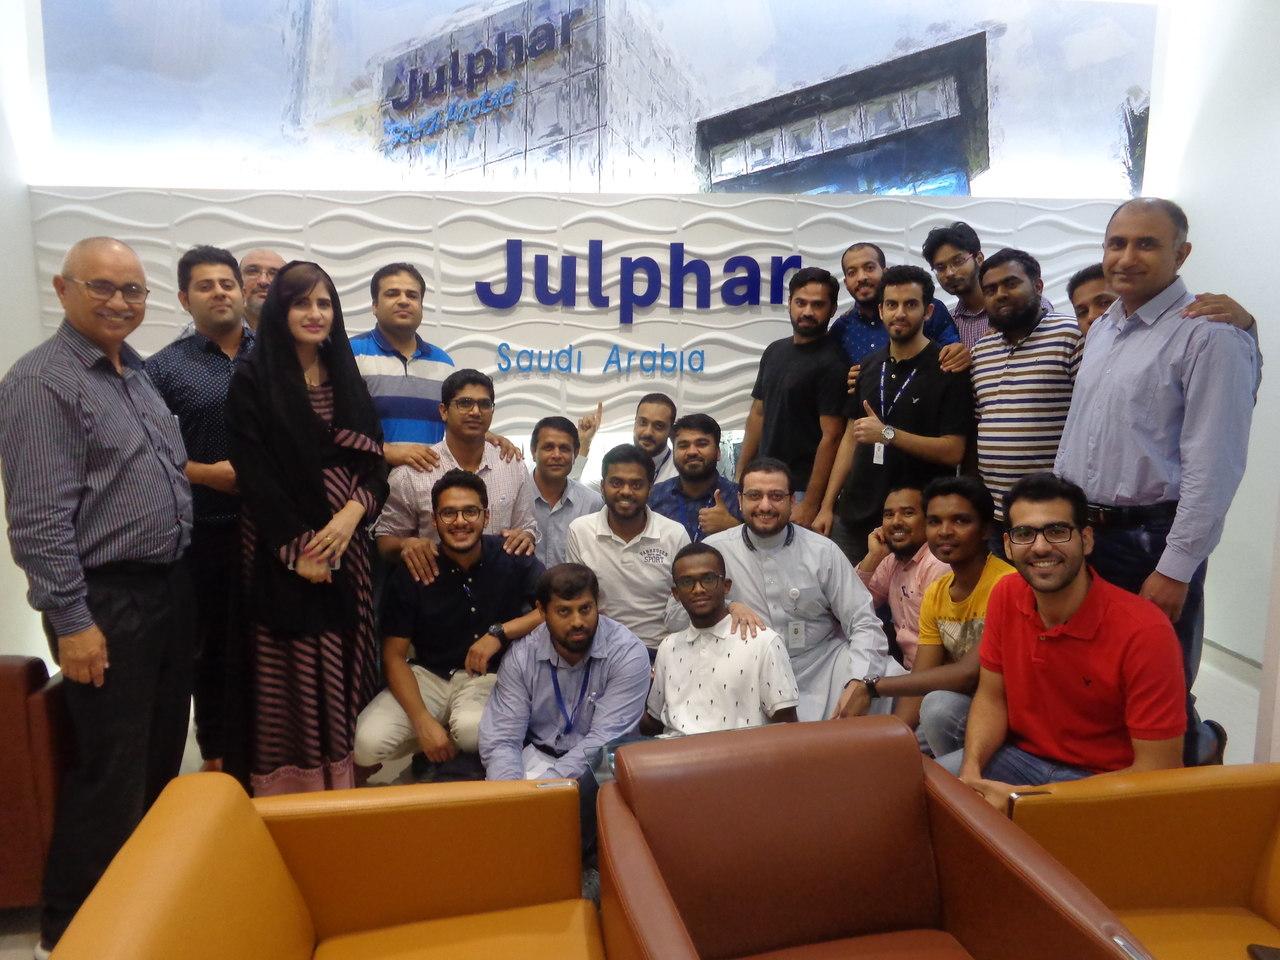 Julphar Saudi Arabia Team Trainings by JTC